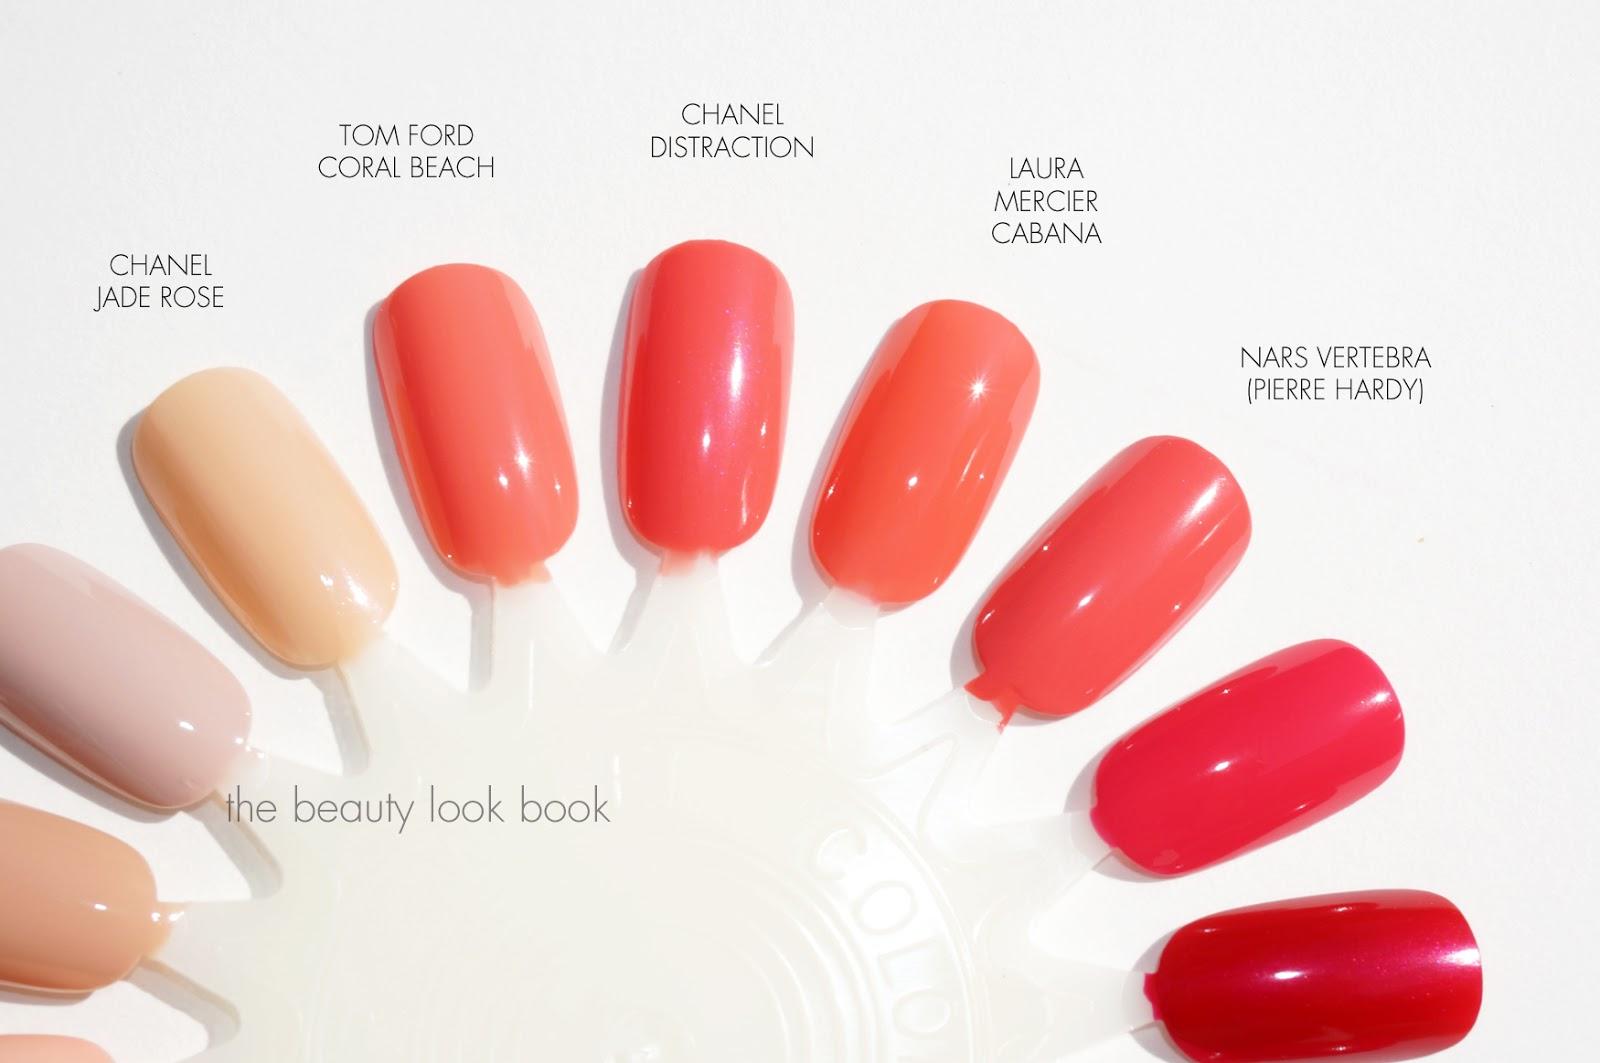 Tom Ford Spring Nail Polish Comparisons To Chanel Mac